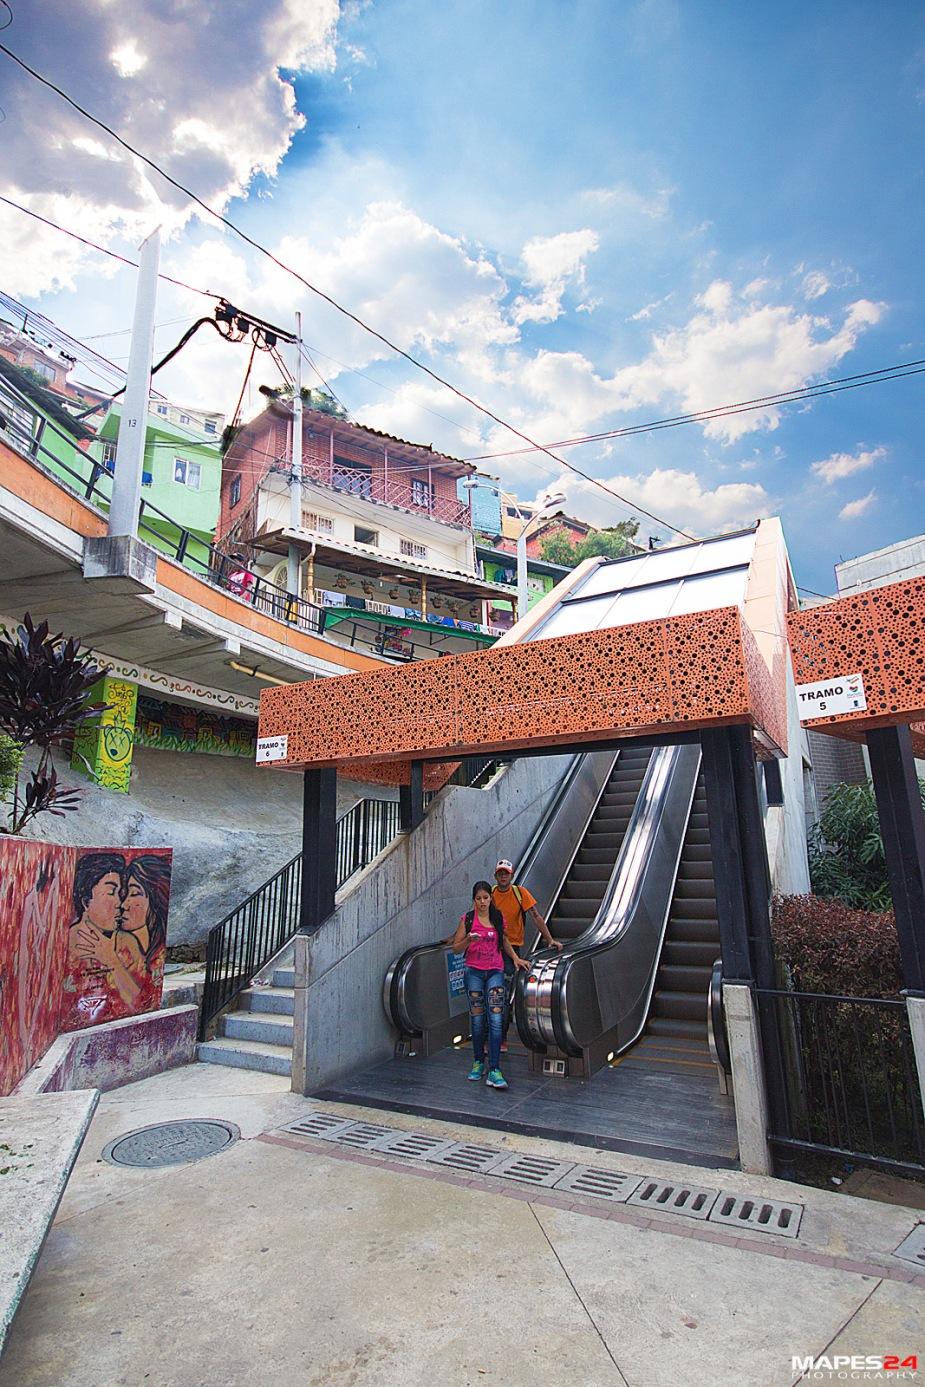 colombian teens taking escalator in comuna 13 in medellin colombia